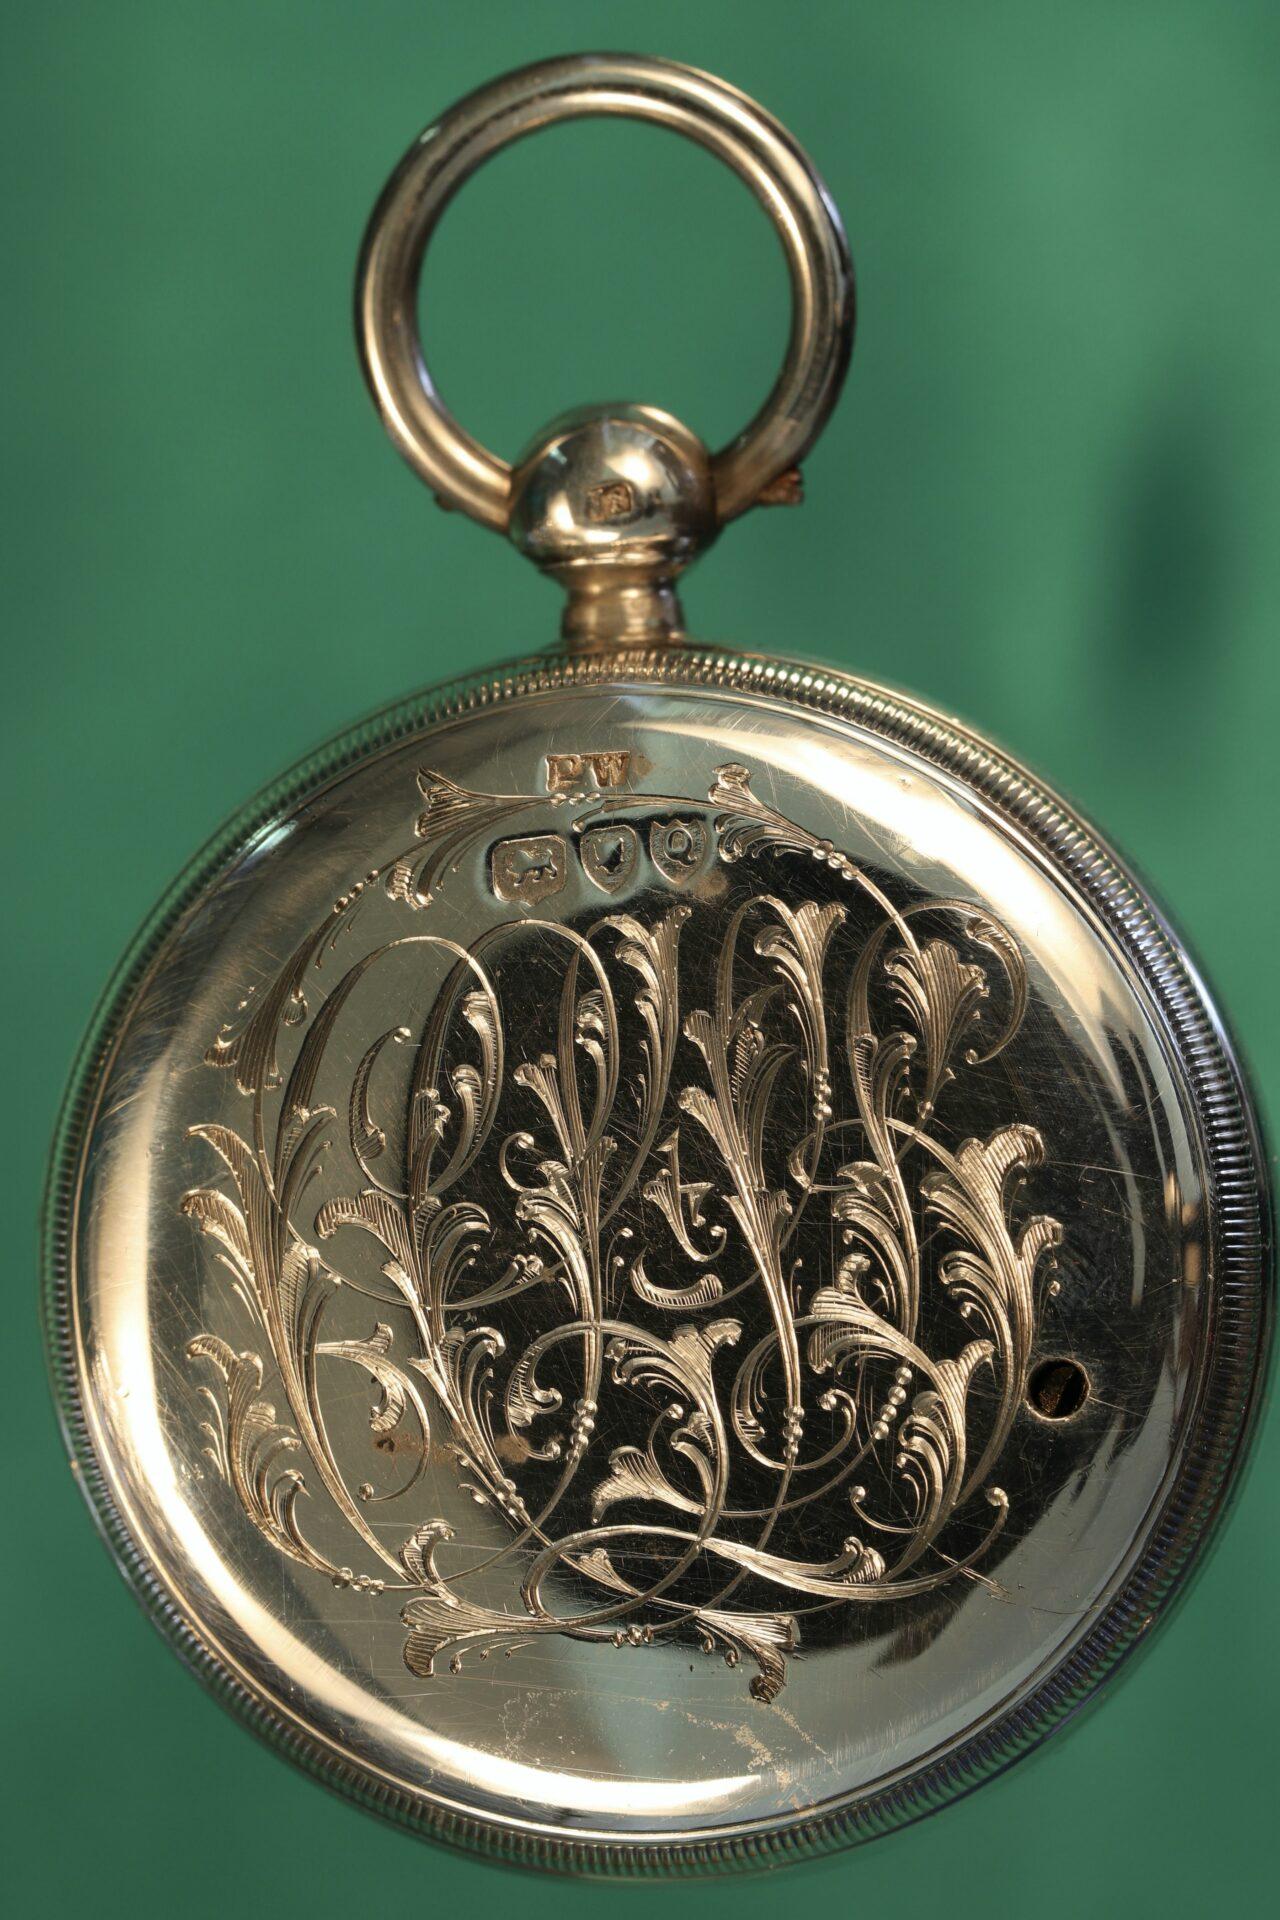 Image of reverse of pocket barometer from Cairns Silver Pocket Barometer Compendium c1892